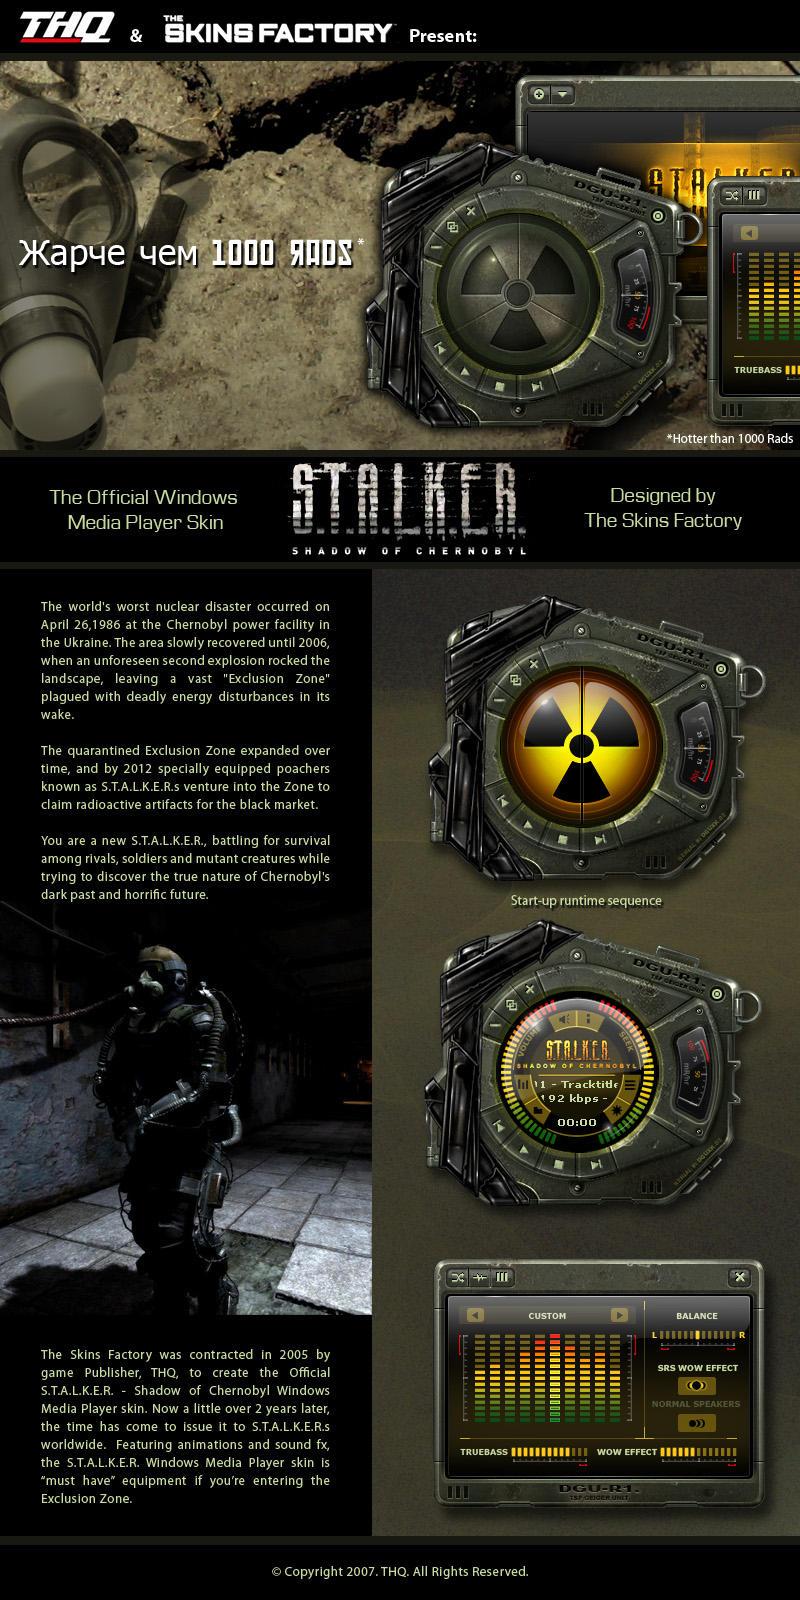 S.T.A.L.K.E.R. by skinsfactory